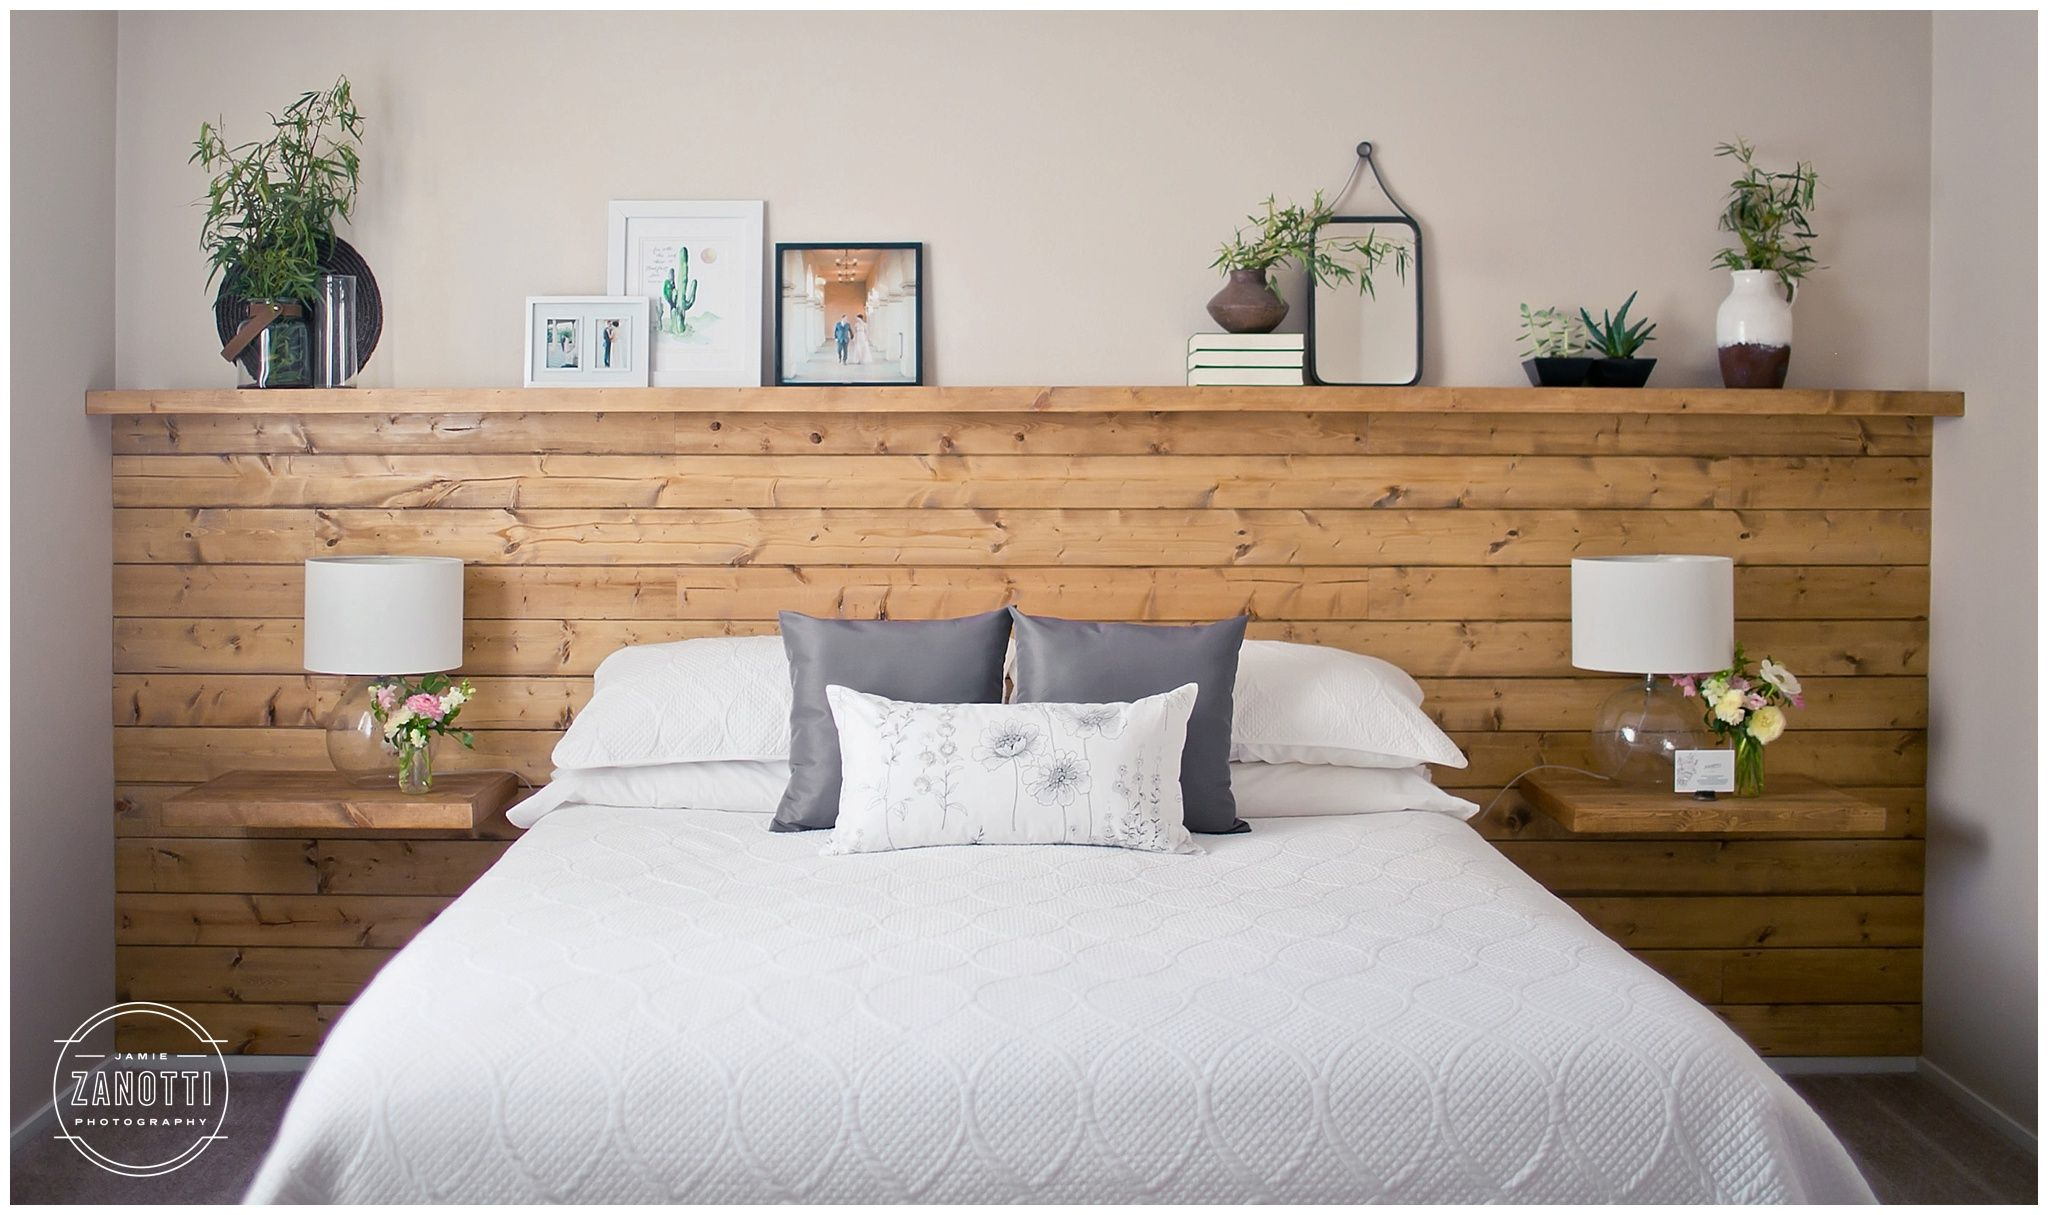 Natural Wood Diy Shiplap Headboard Wall Shelf Floating Nightstands